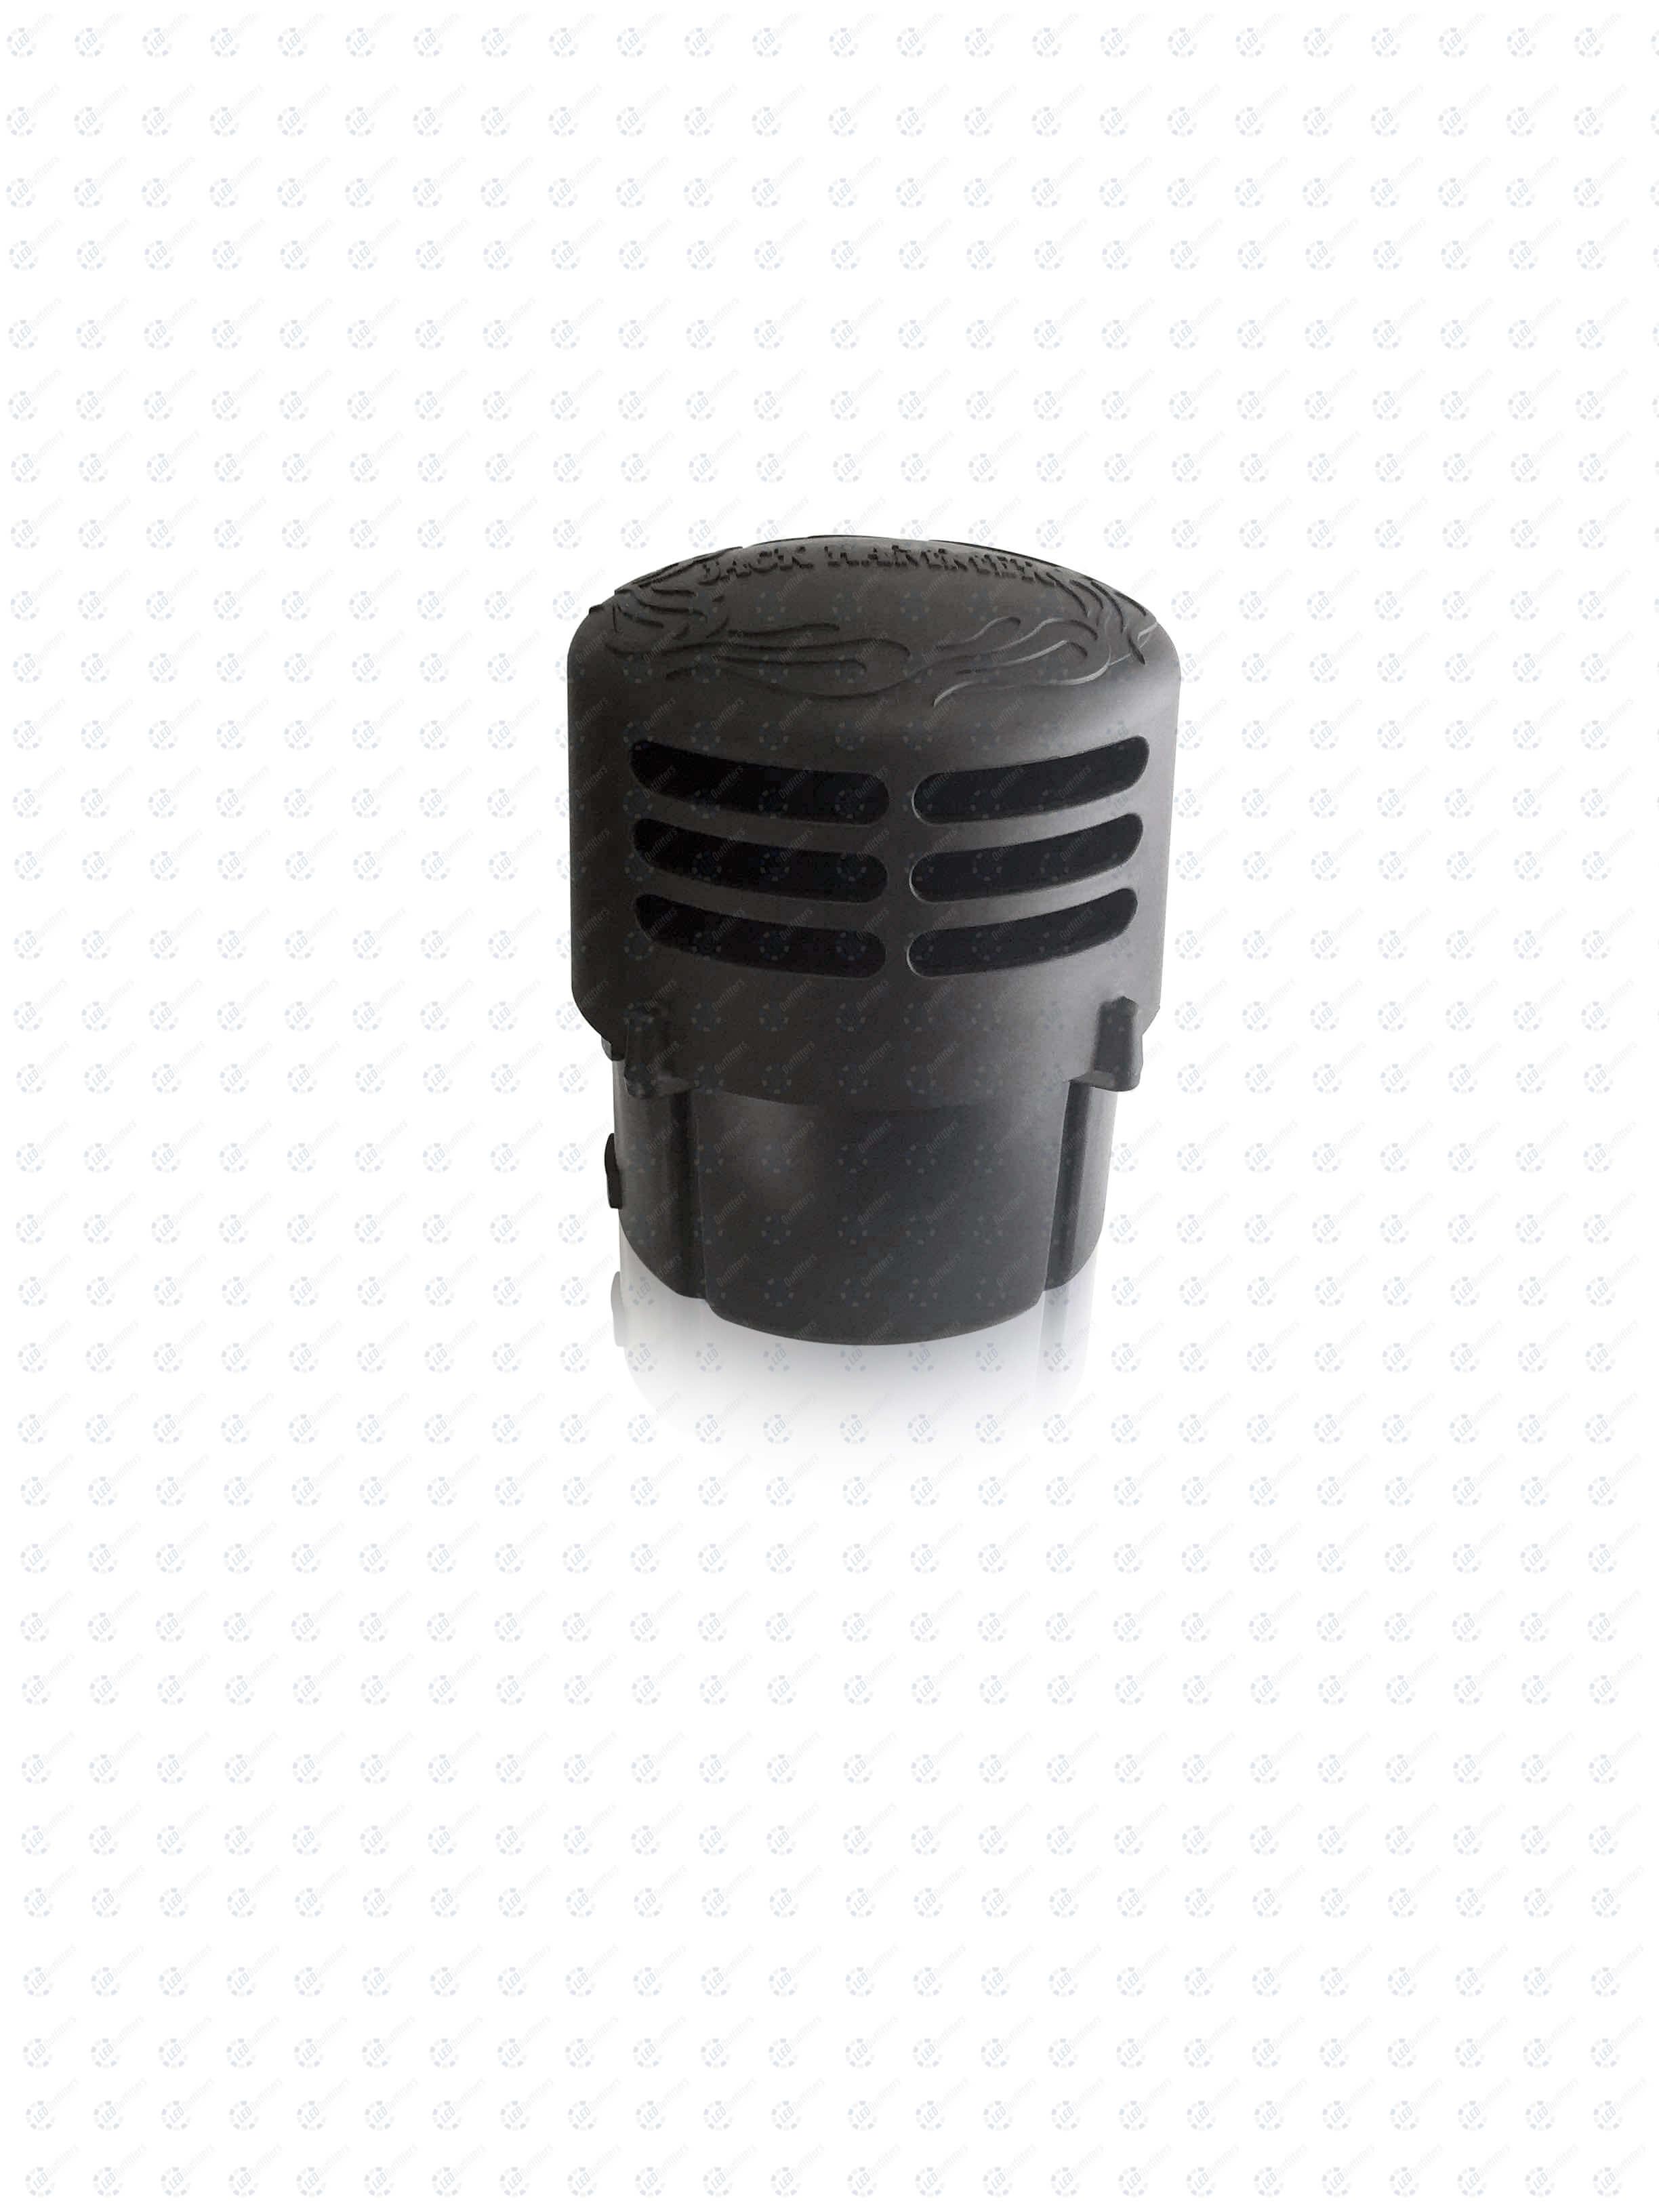 Damega Jack Hammer Emergency Vehicle Siren Amplifiers